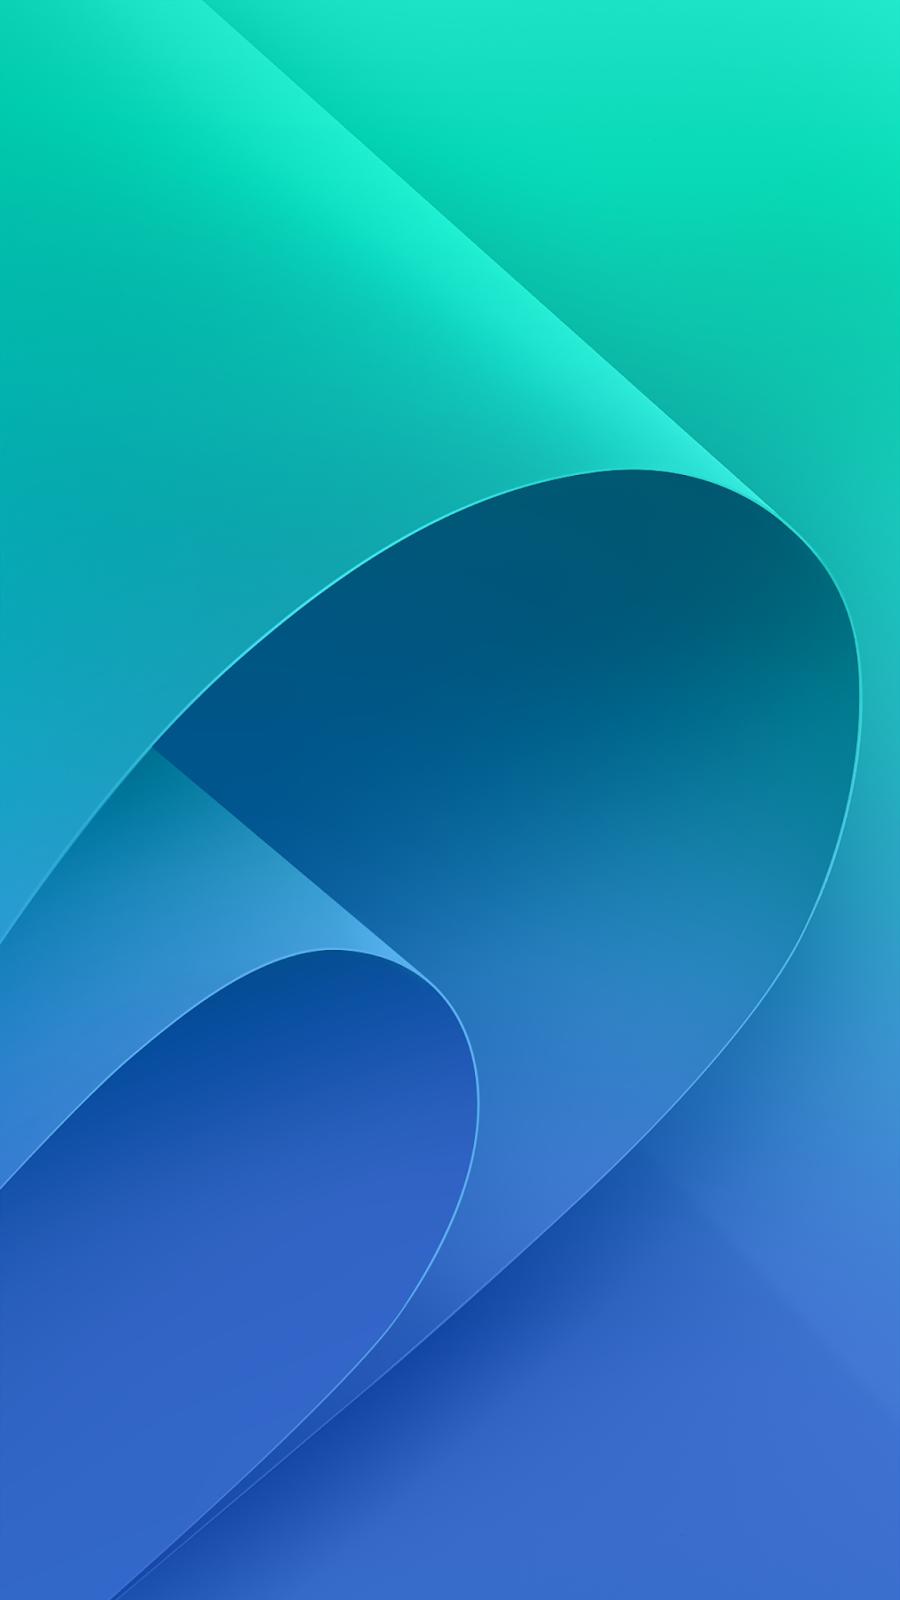 Wallpaper, Zenfone 4 - Asus Zenfone Max Pro M1 (#1626831) - HD